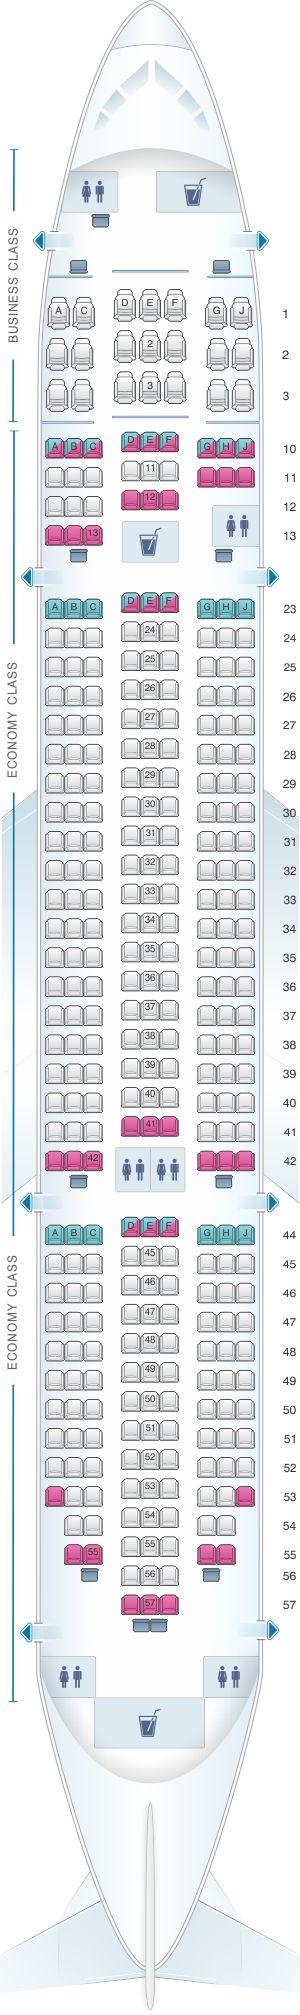 Seat Map Jetstar Airways Boeing 787-8 Dreamliner   SeatMaestro.com